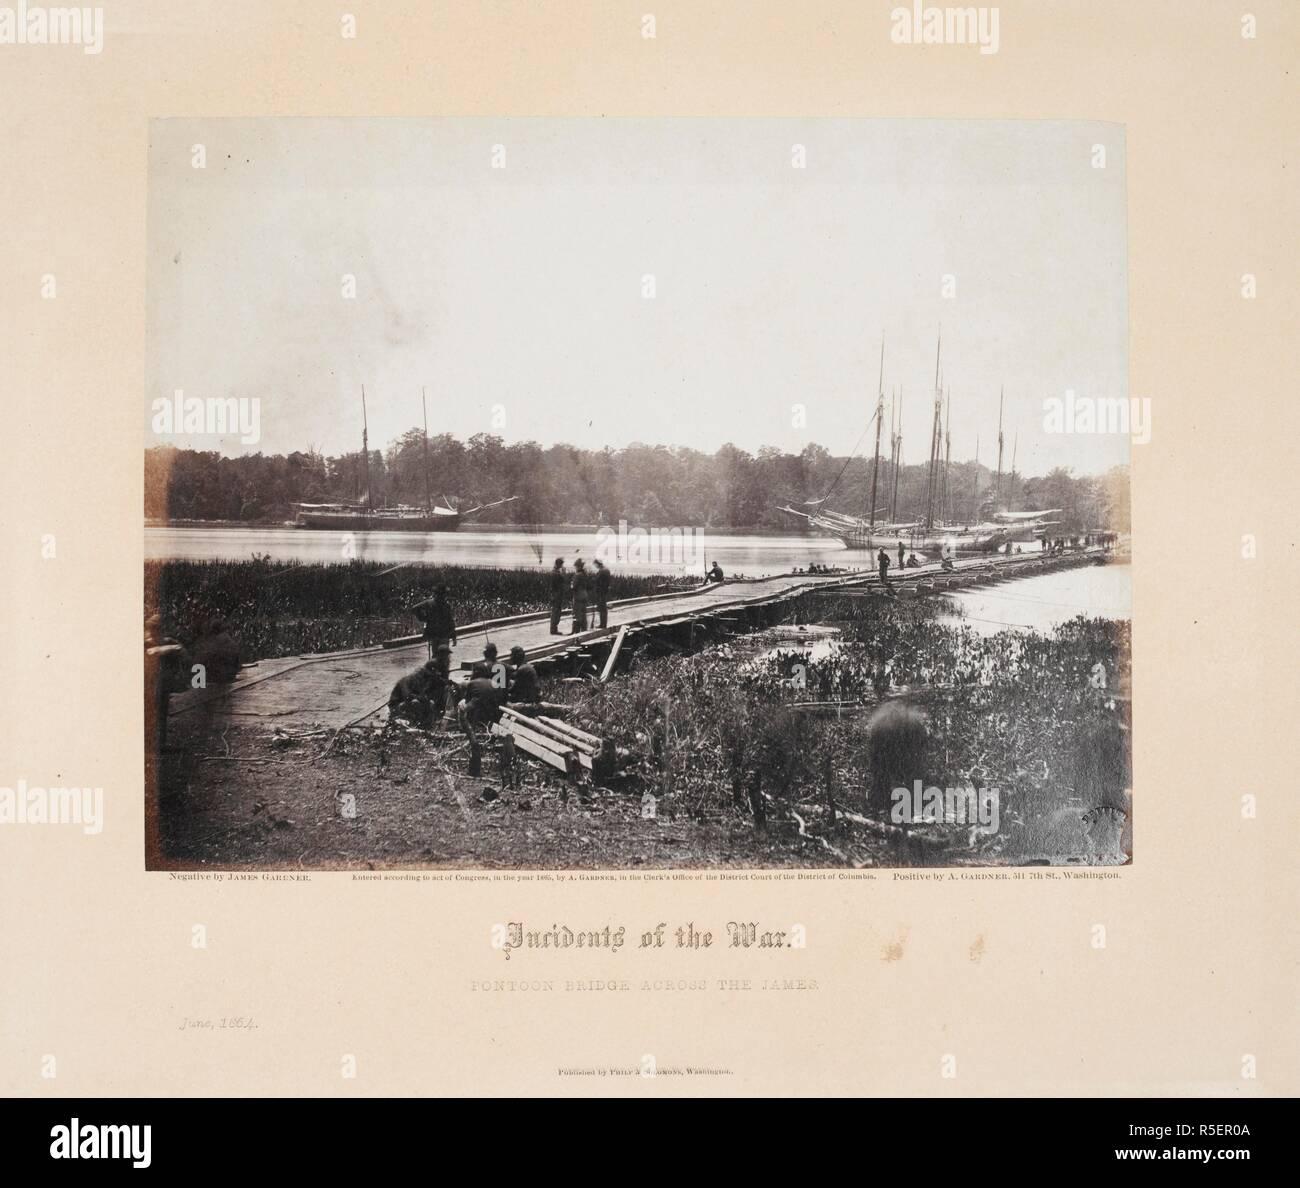 hight resolution of pontoon bridge across the james june 1864 gardner s photographic